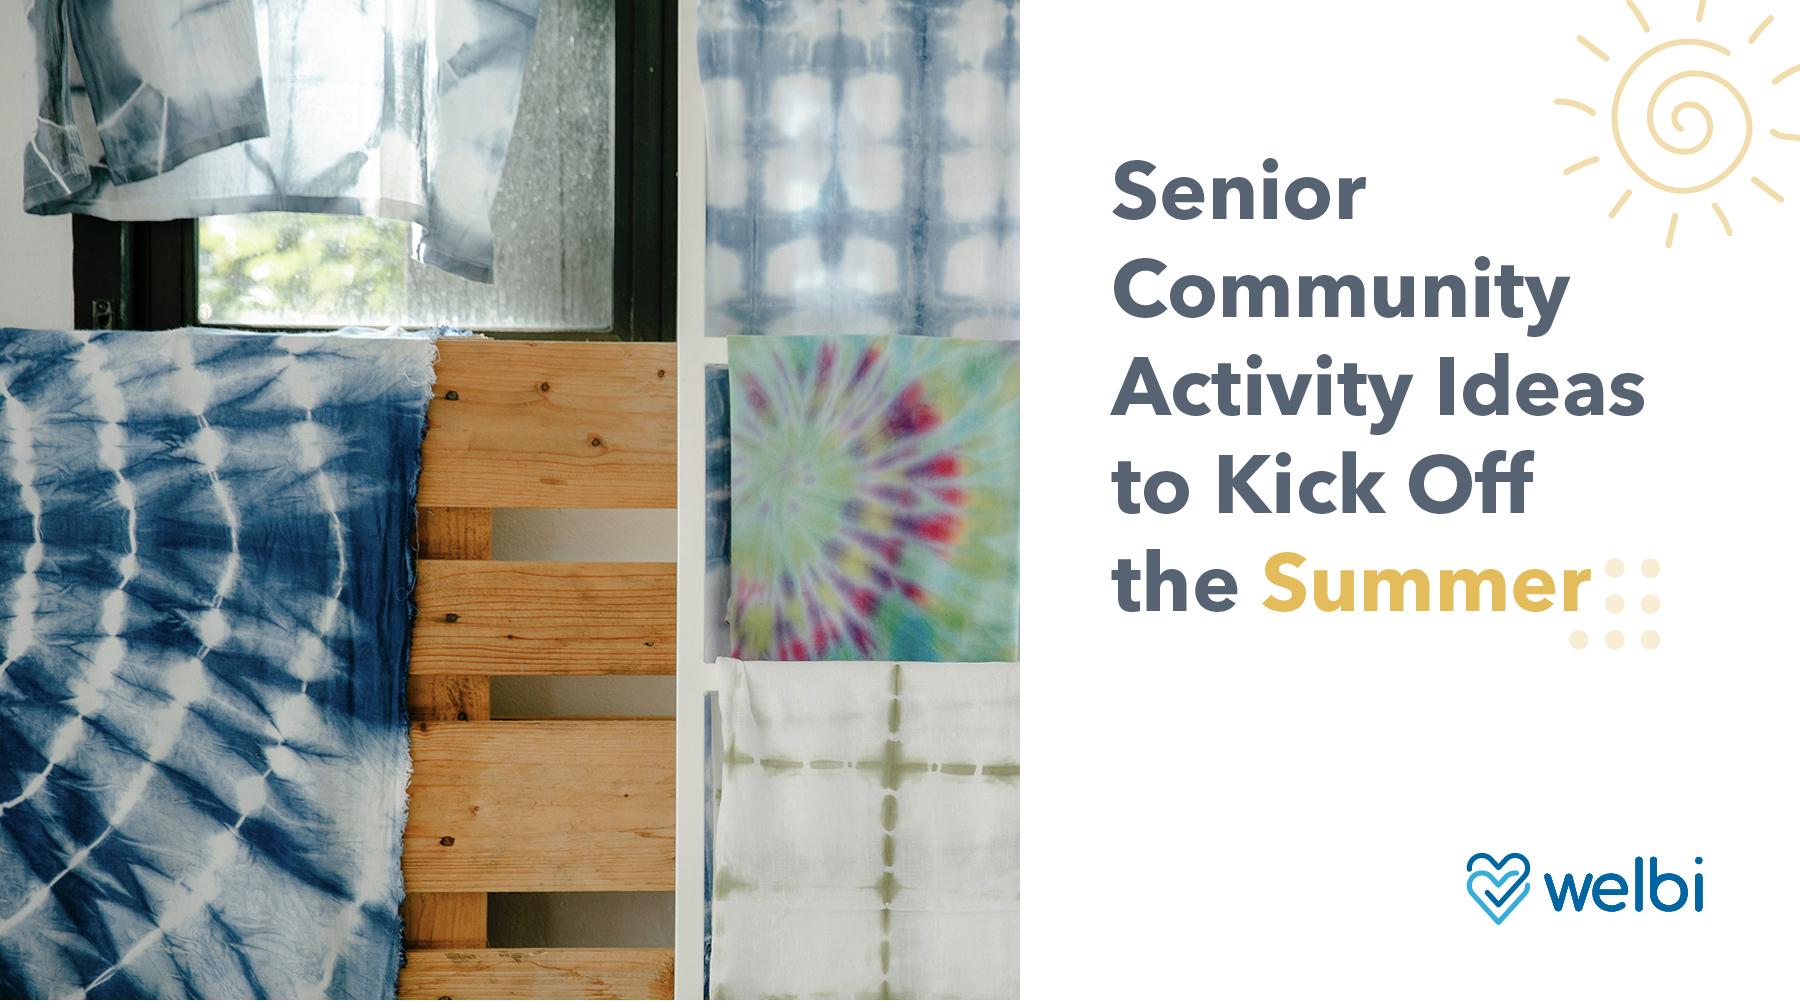 Senior Community Activity Ideas to Kick Off the Summer